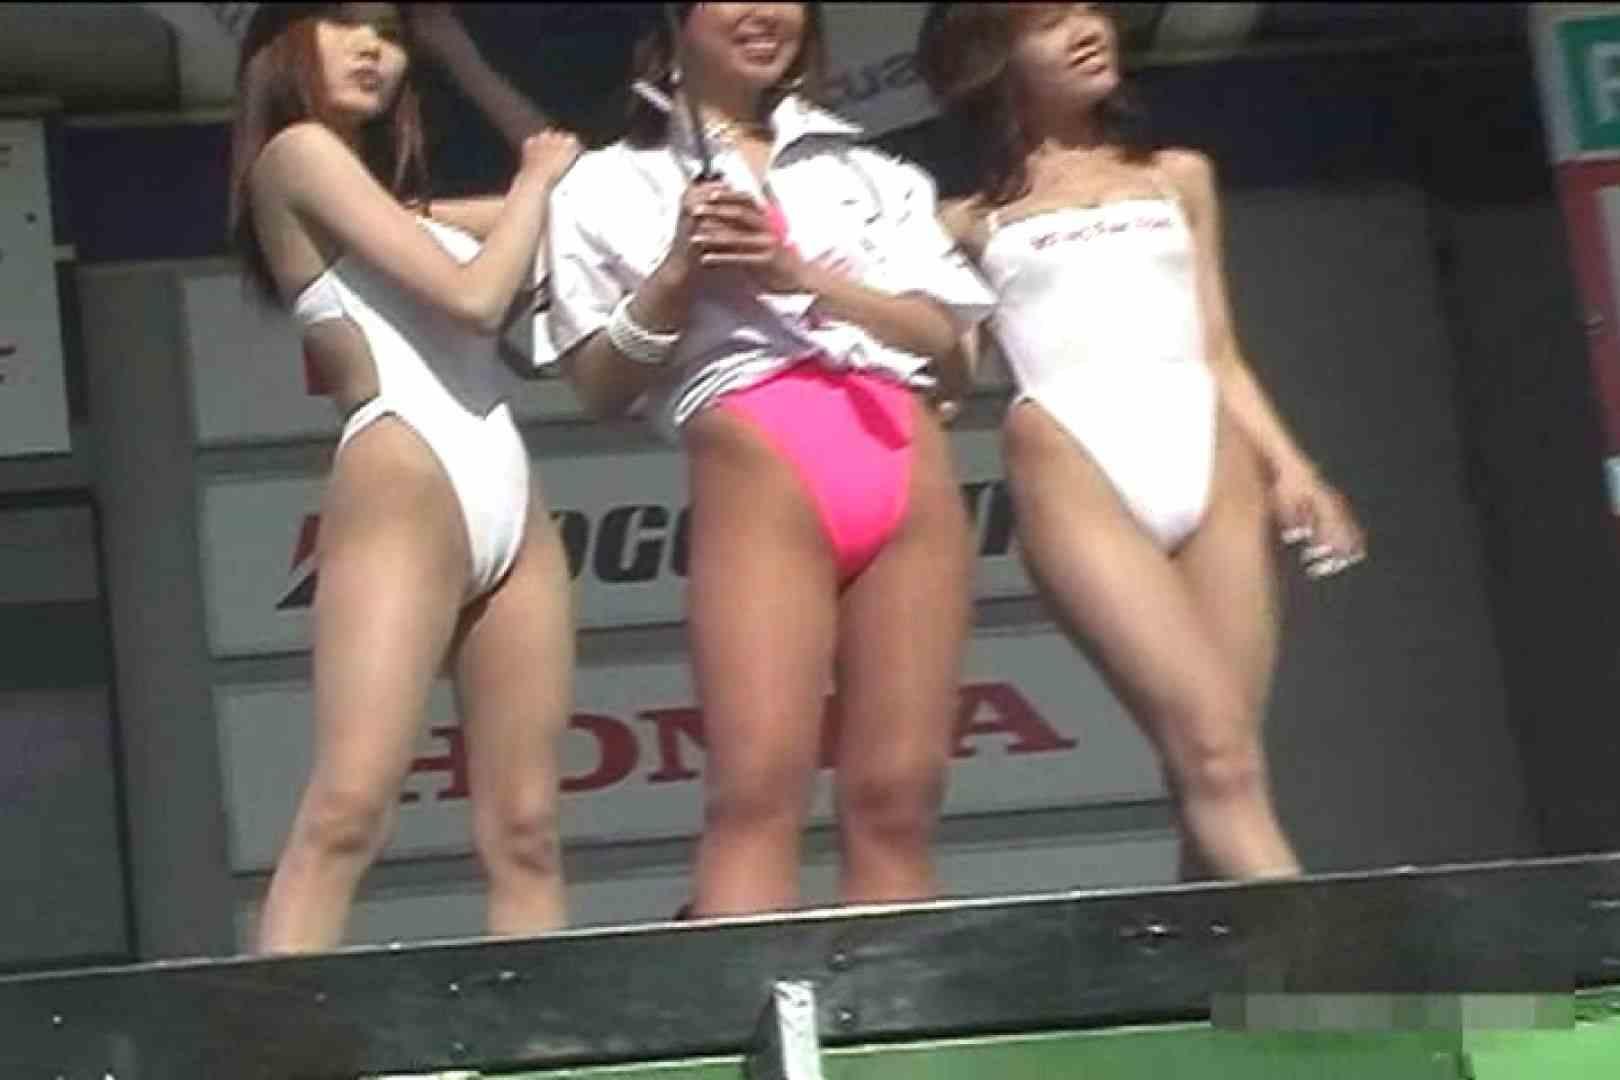 RQカメラ地獄Vol.14 股間   美しいOLの裸体  89pic 70